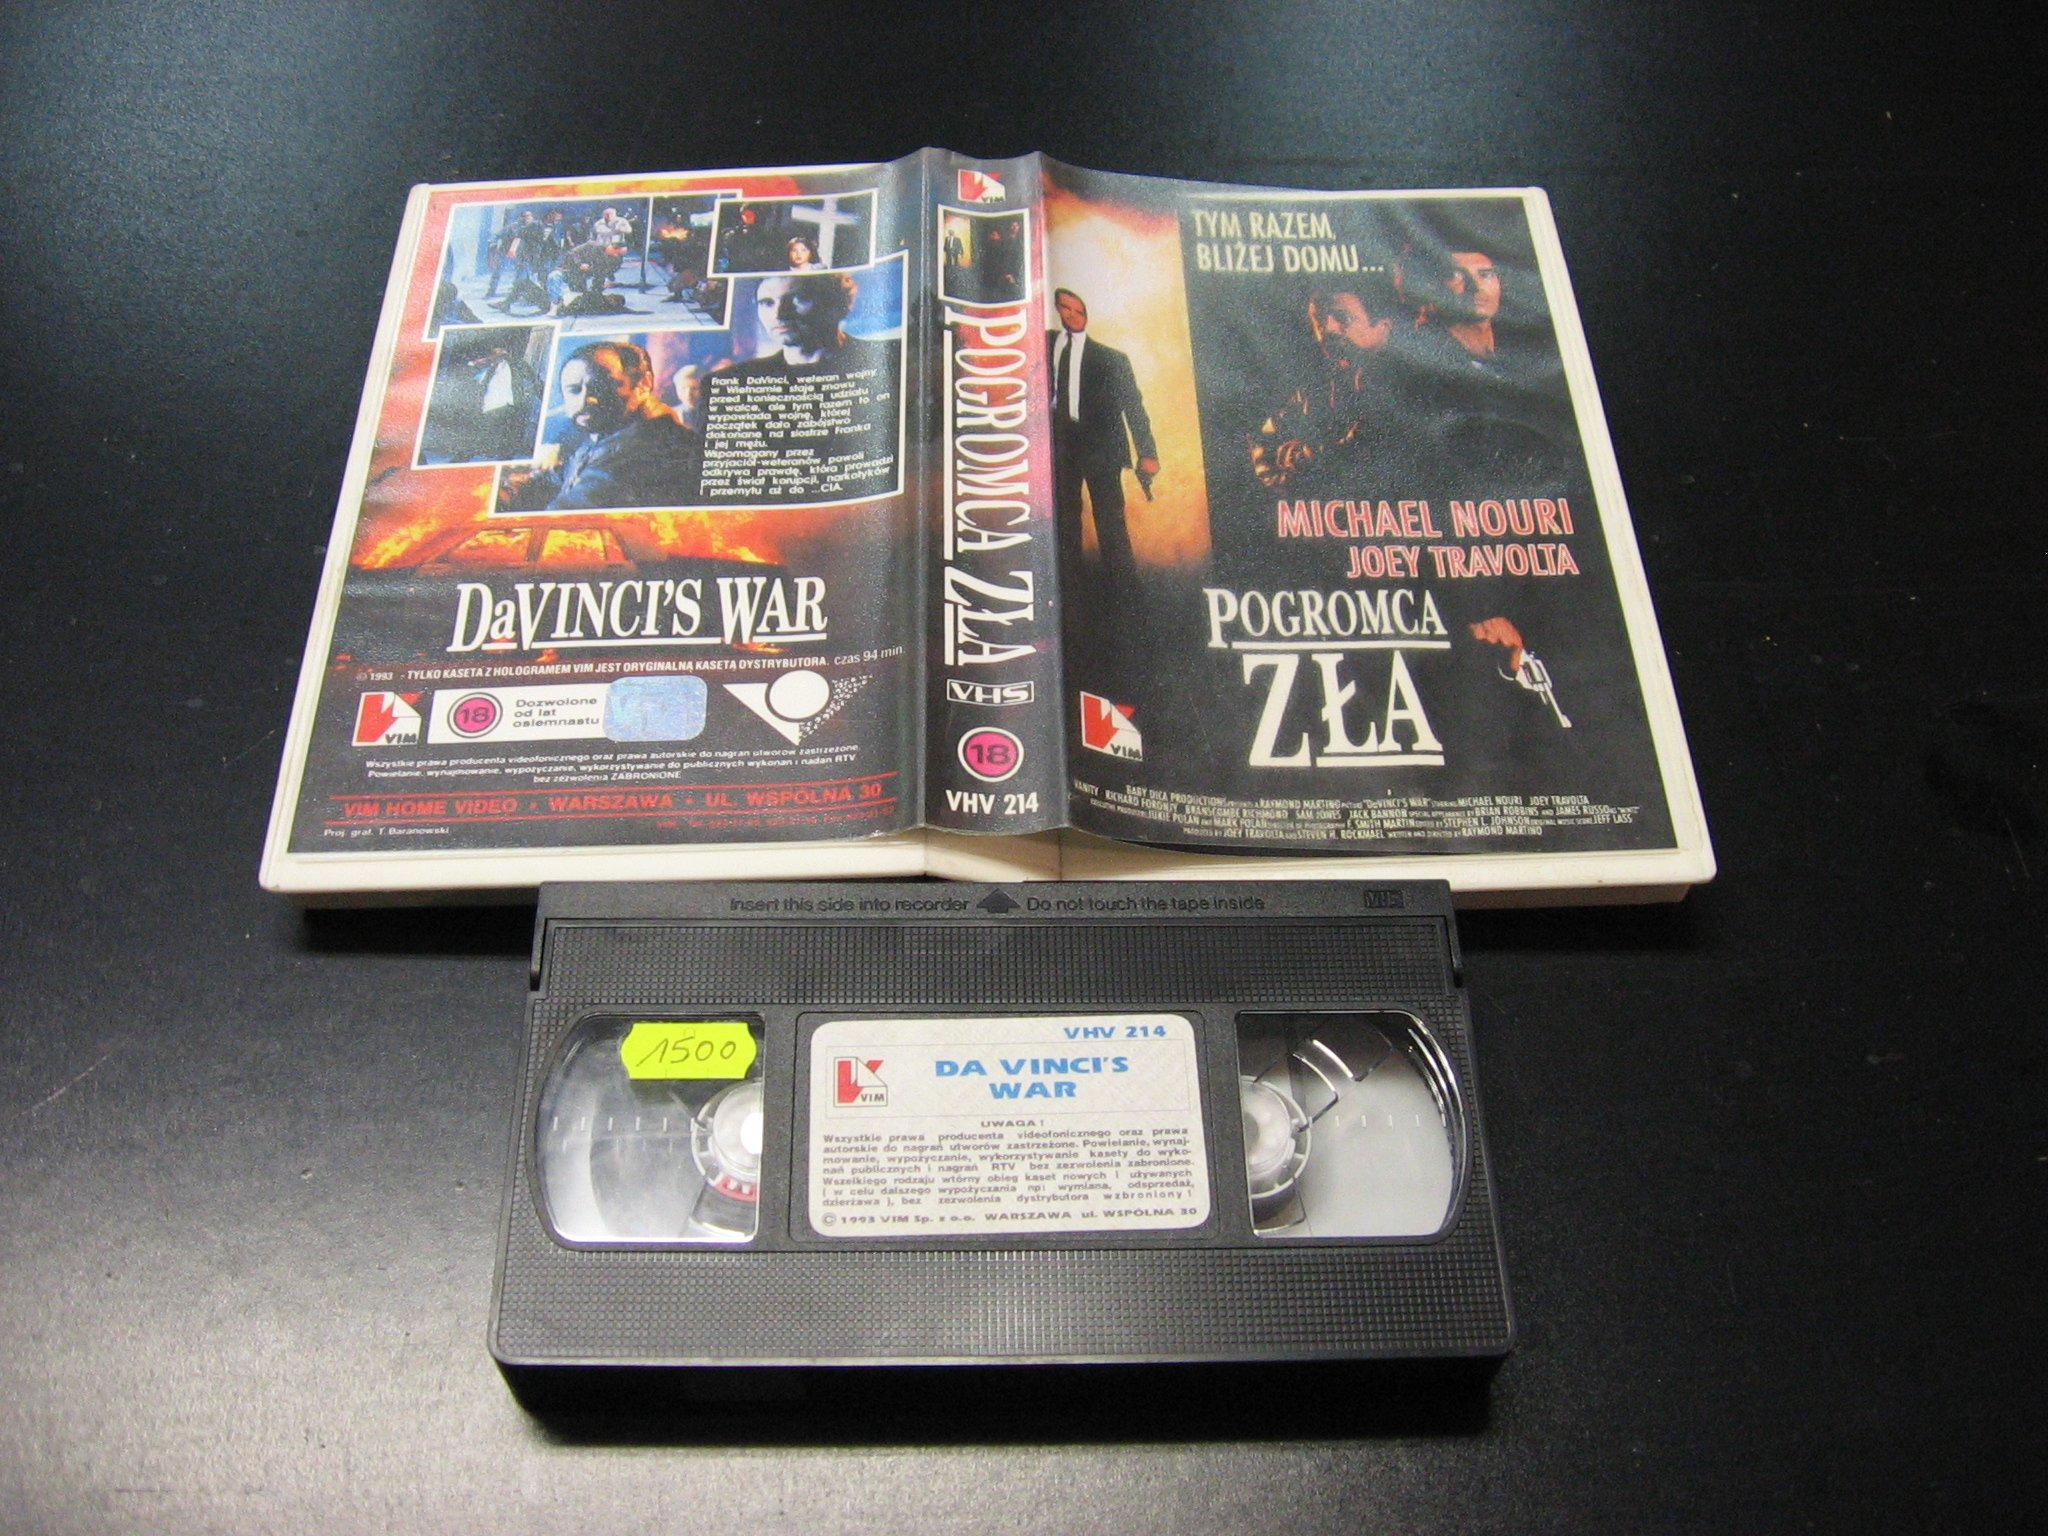 POGROMCA ZŁA -  kaseta VHS - 0991 Opole - AlleOpole.pl